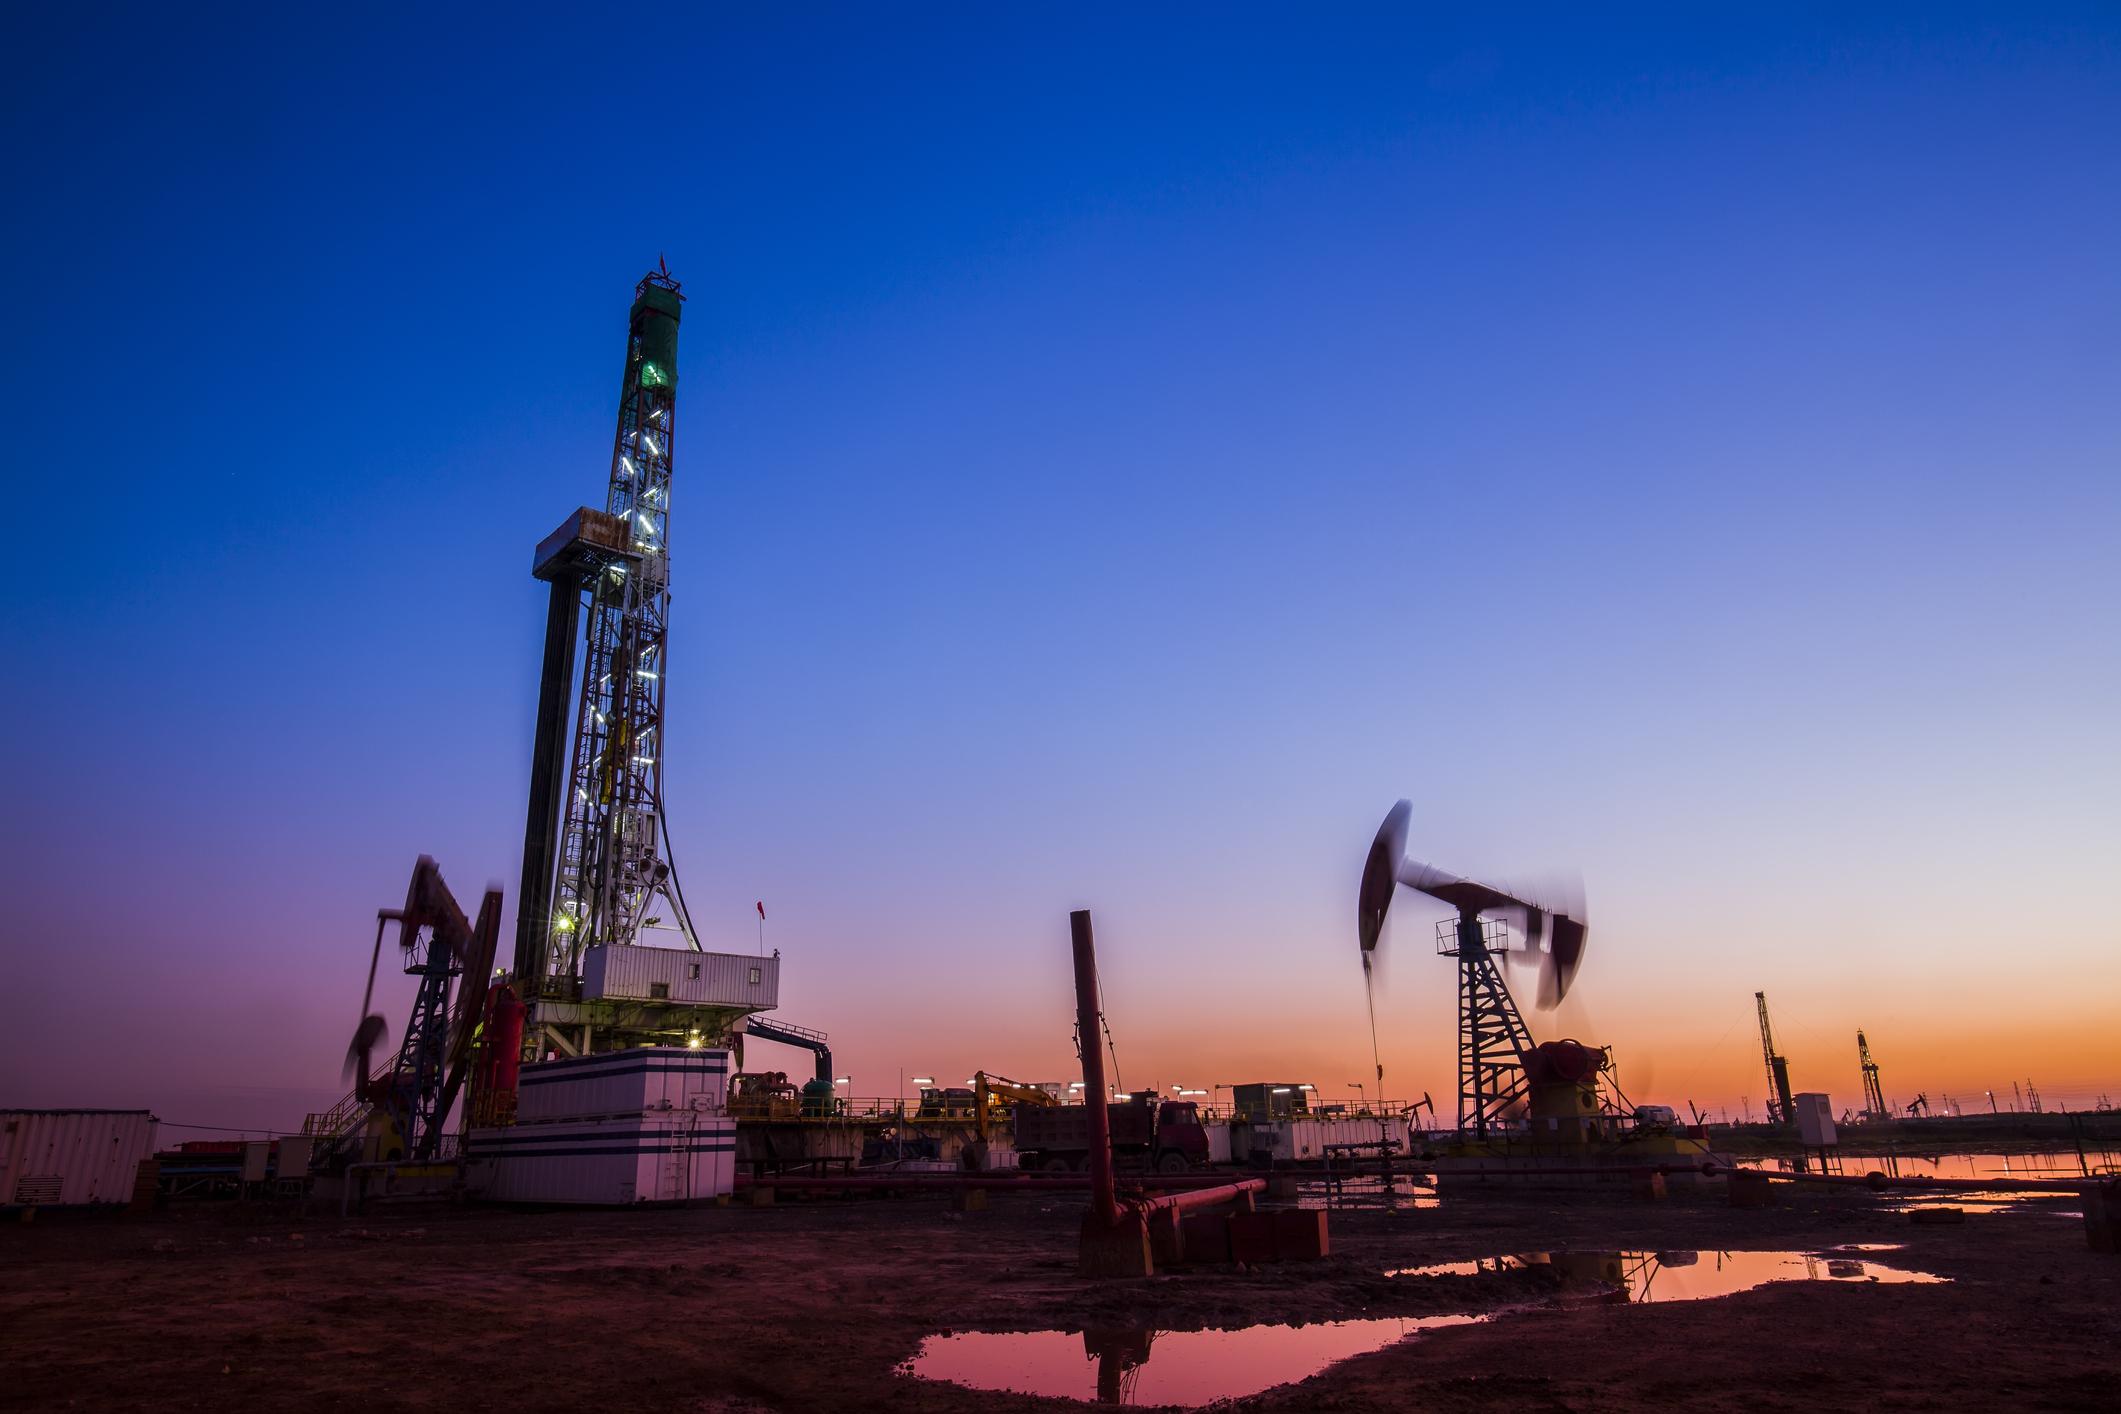 Drilling rig and pumpjack at dusk.